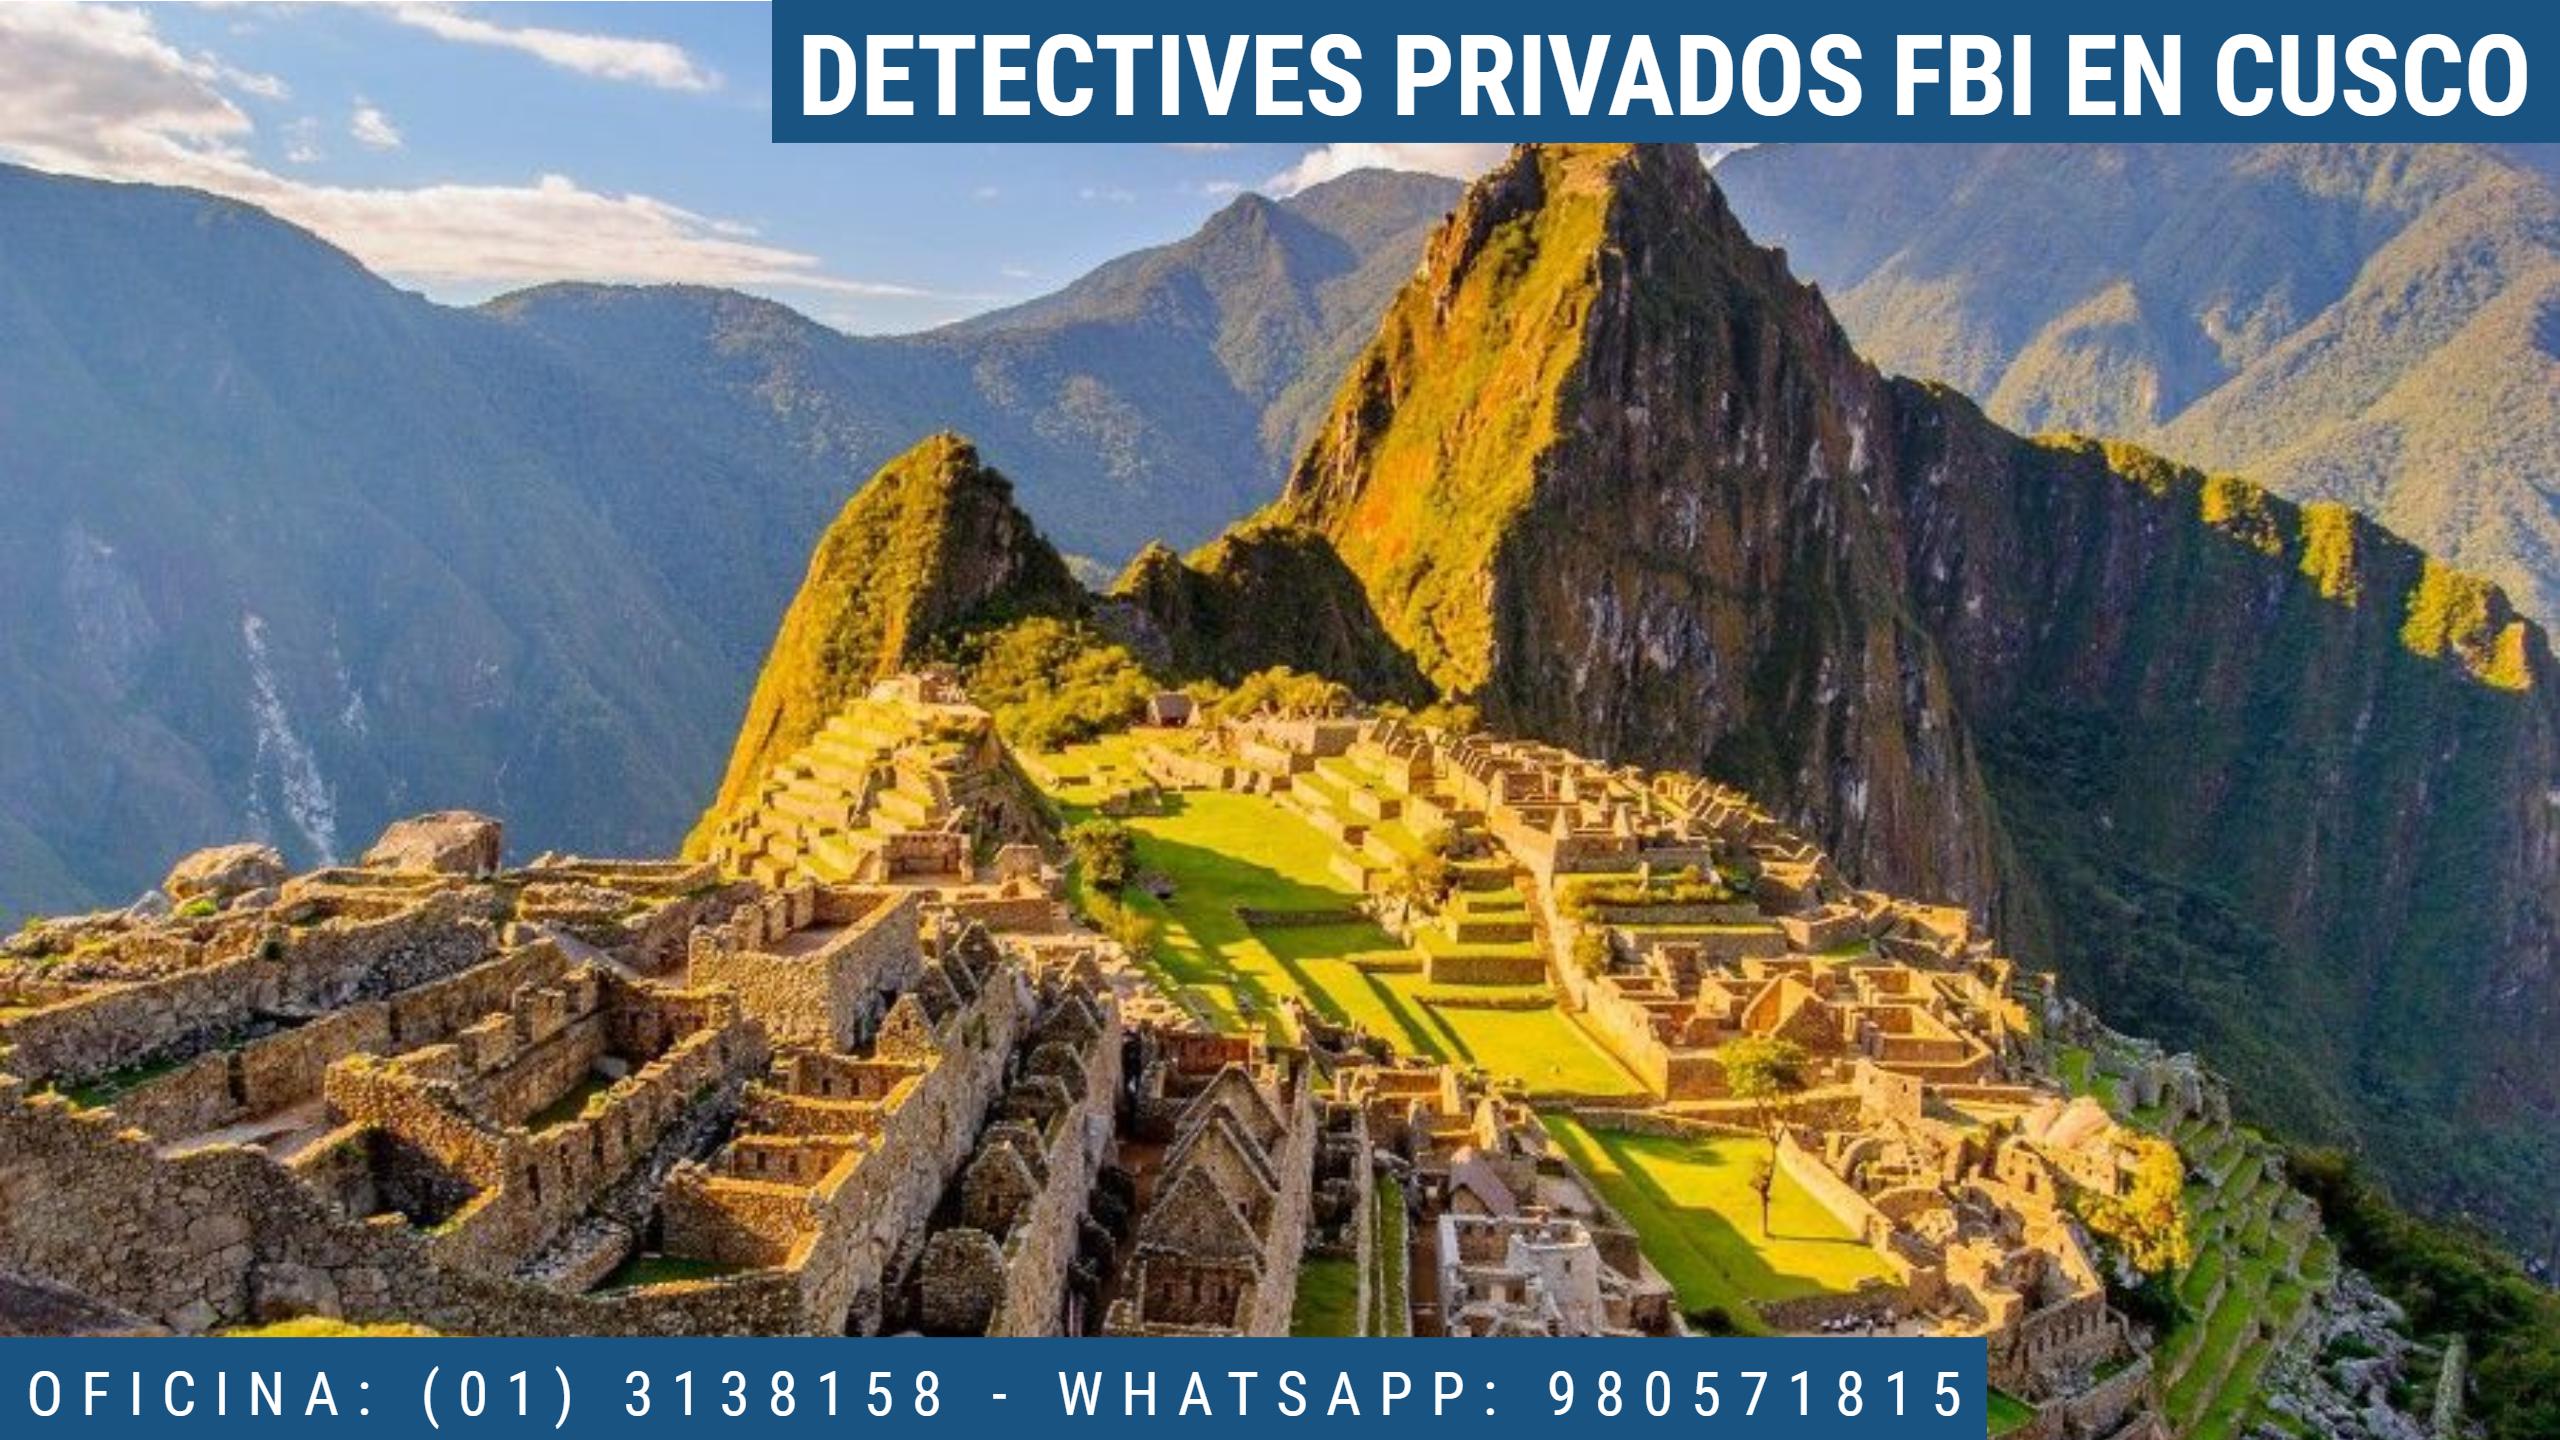 INVESTIGACIÓN PRIVADA FBI EN CUSCO - PERU